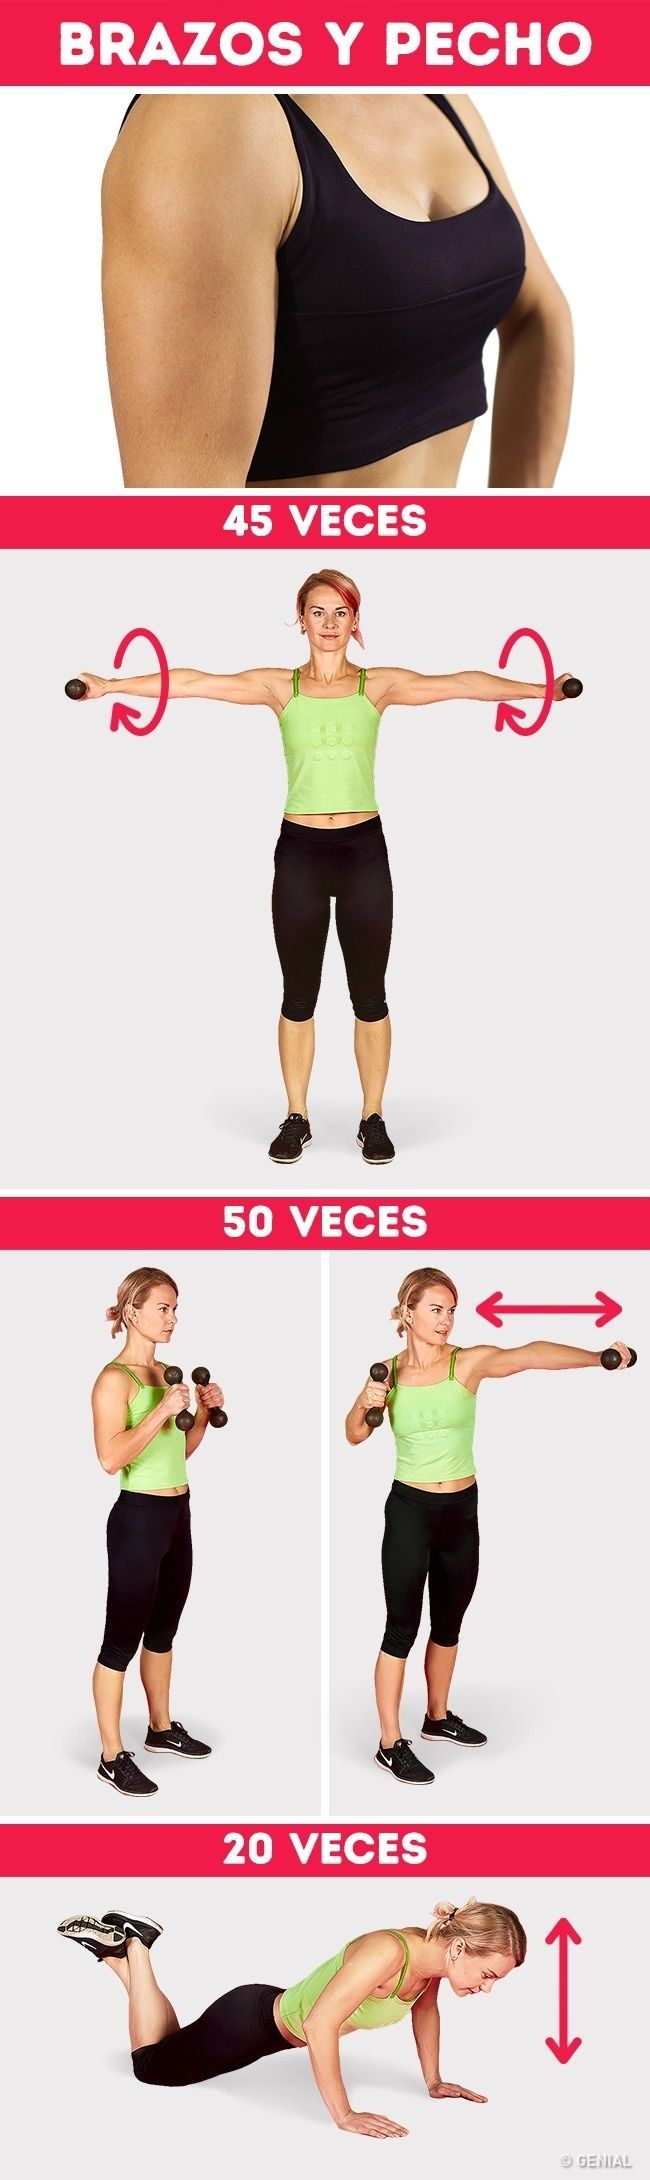 Sólo Necesitas Un Par De Pesas Y Voluntad Para Tener Brazos Sexys Ejercicios Para Brazos Rutina Para Brazos Paso A Easy Yoga Workouts Workout Plan Workout